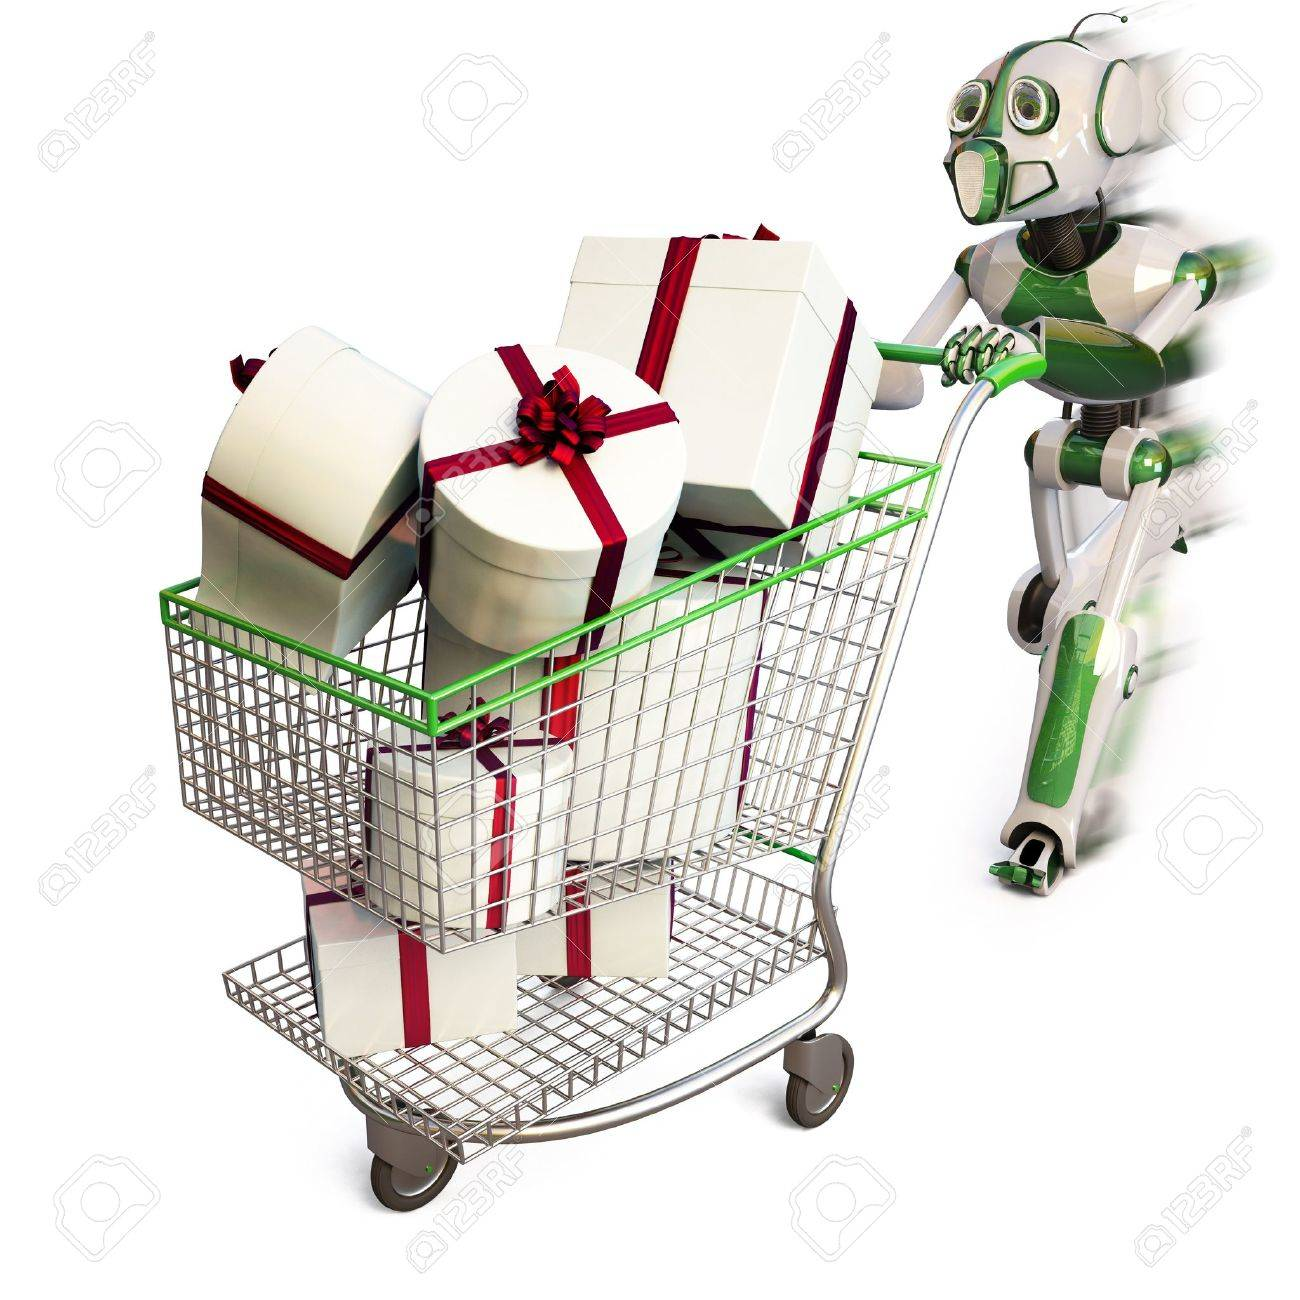 robot runs pushing a shopping cart with gifts. Stock Photo - 8170056